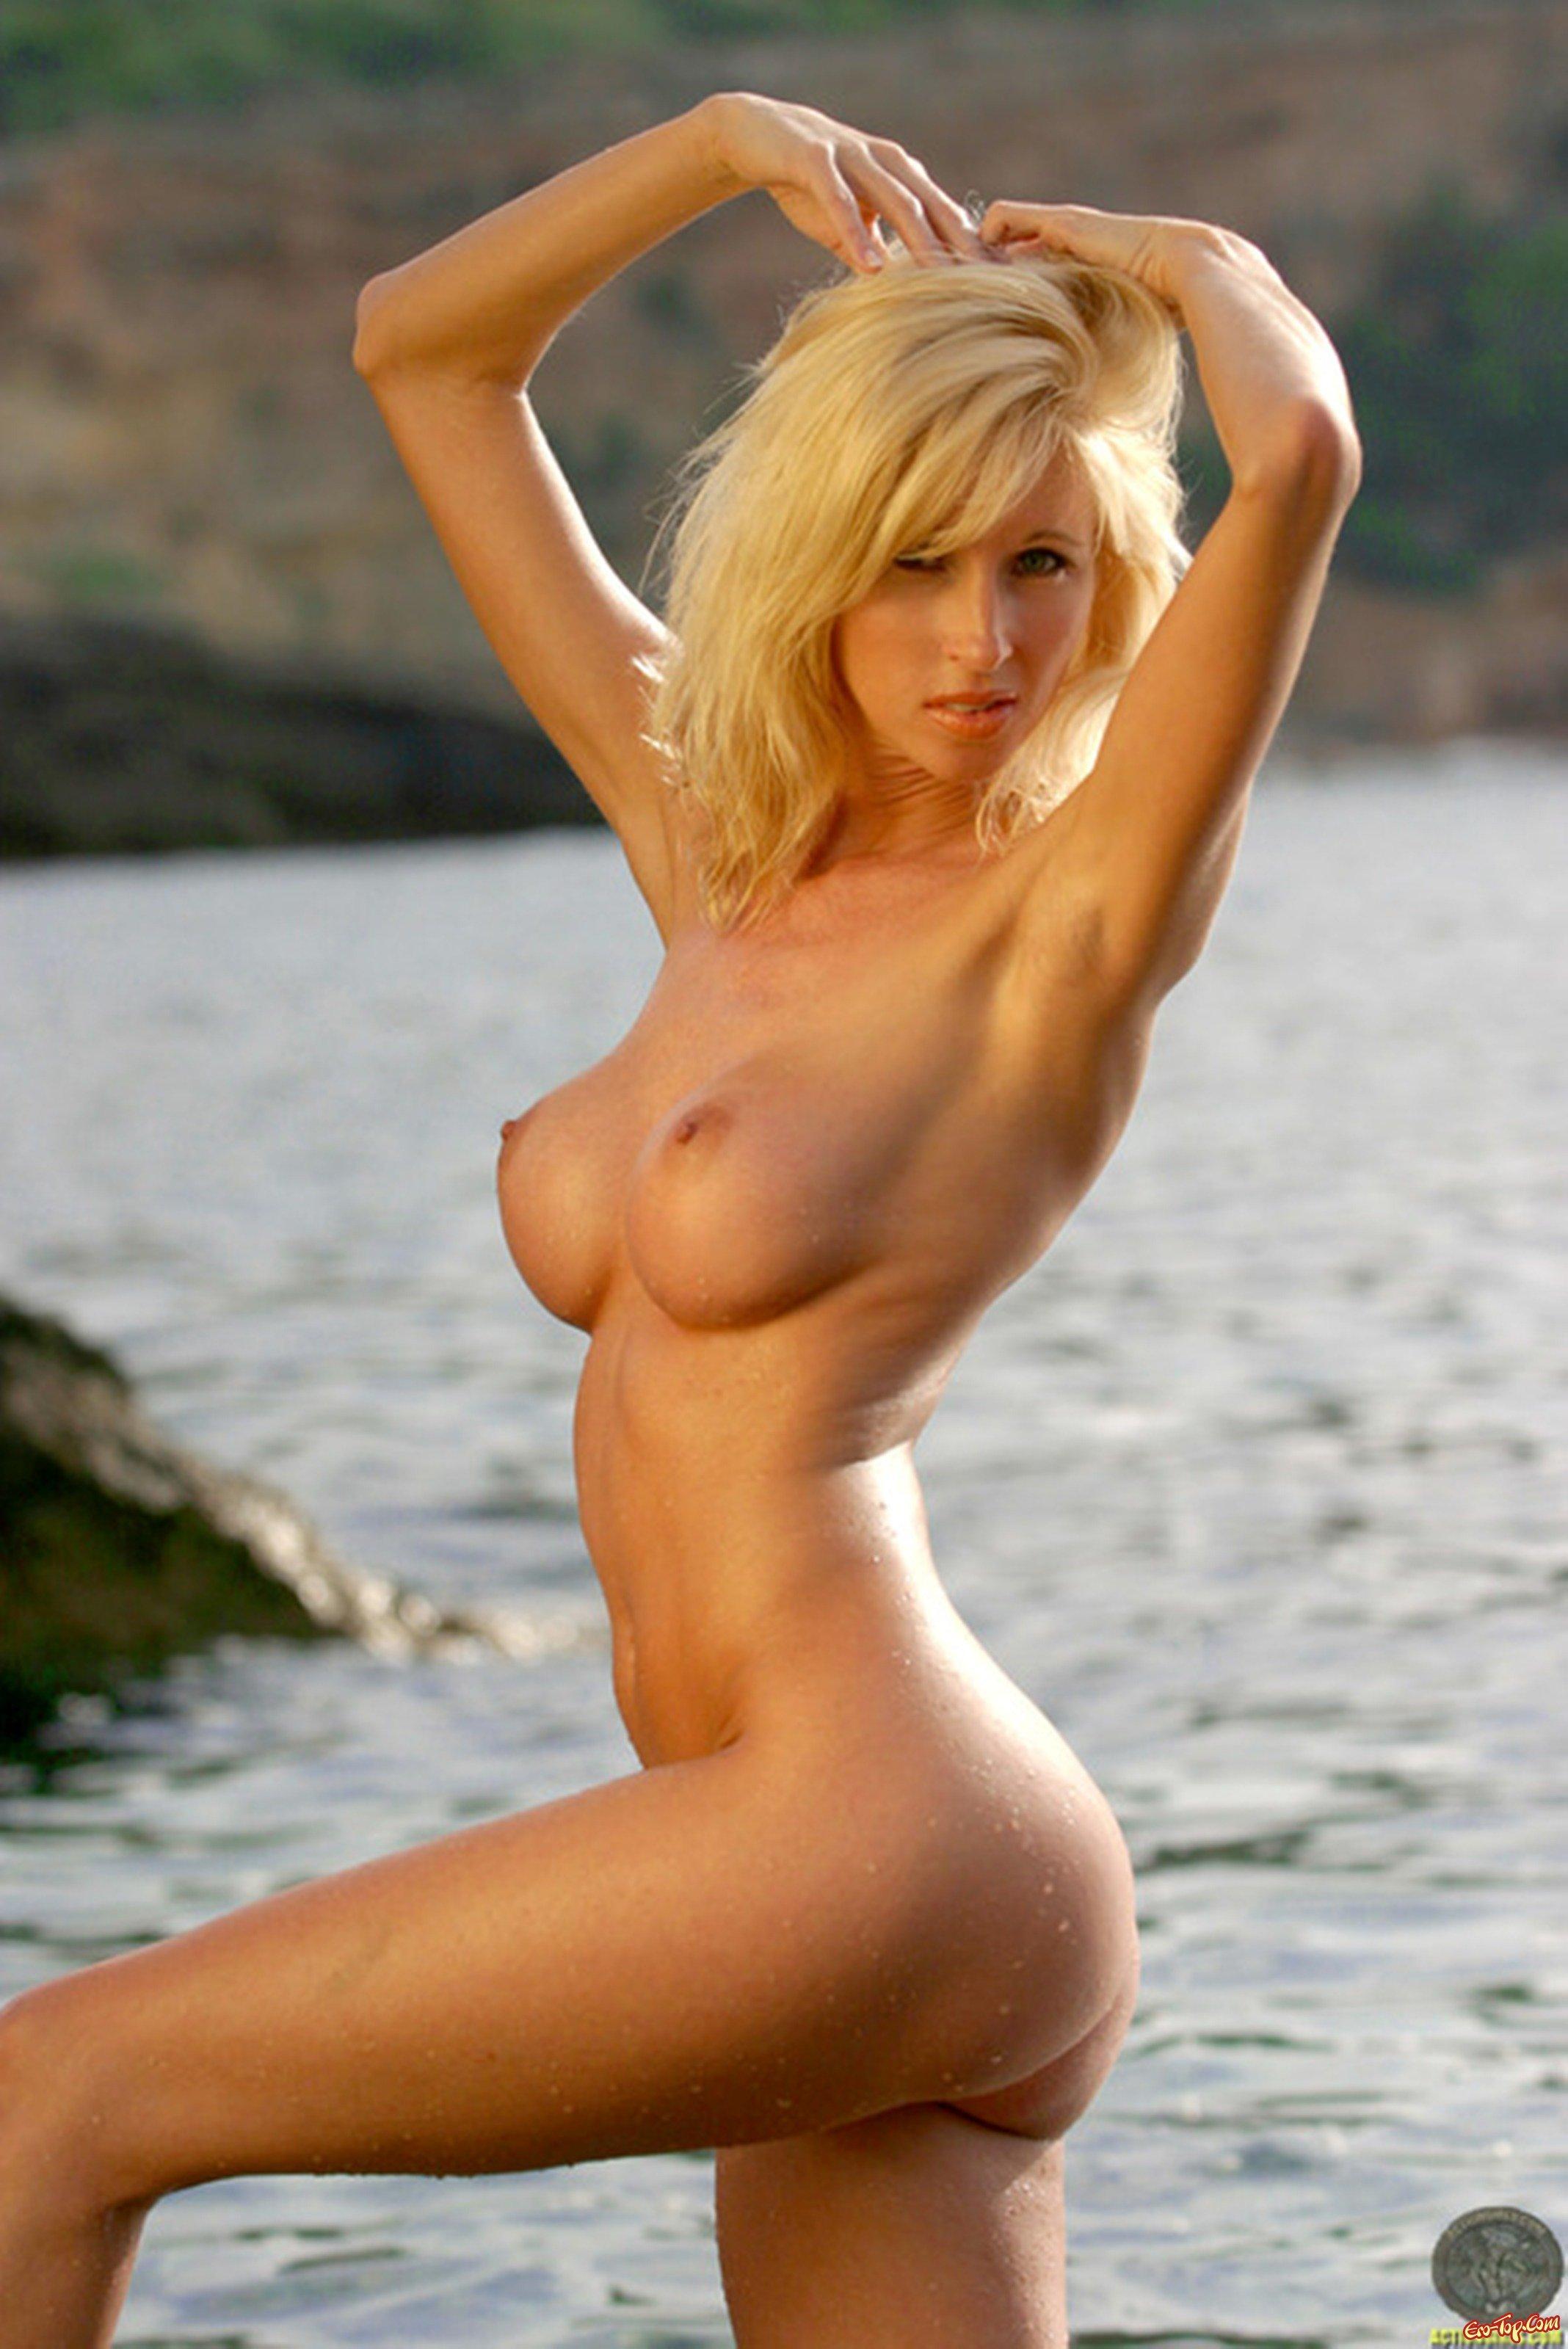 golie-blondinki-golie-zhenshini